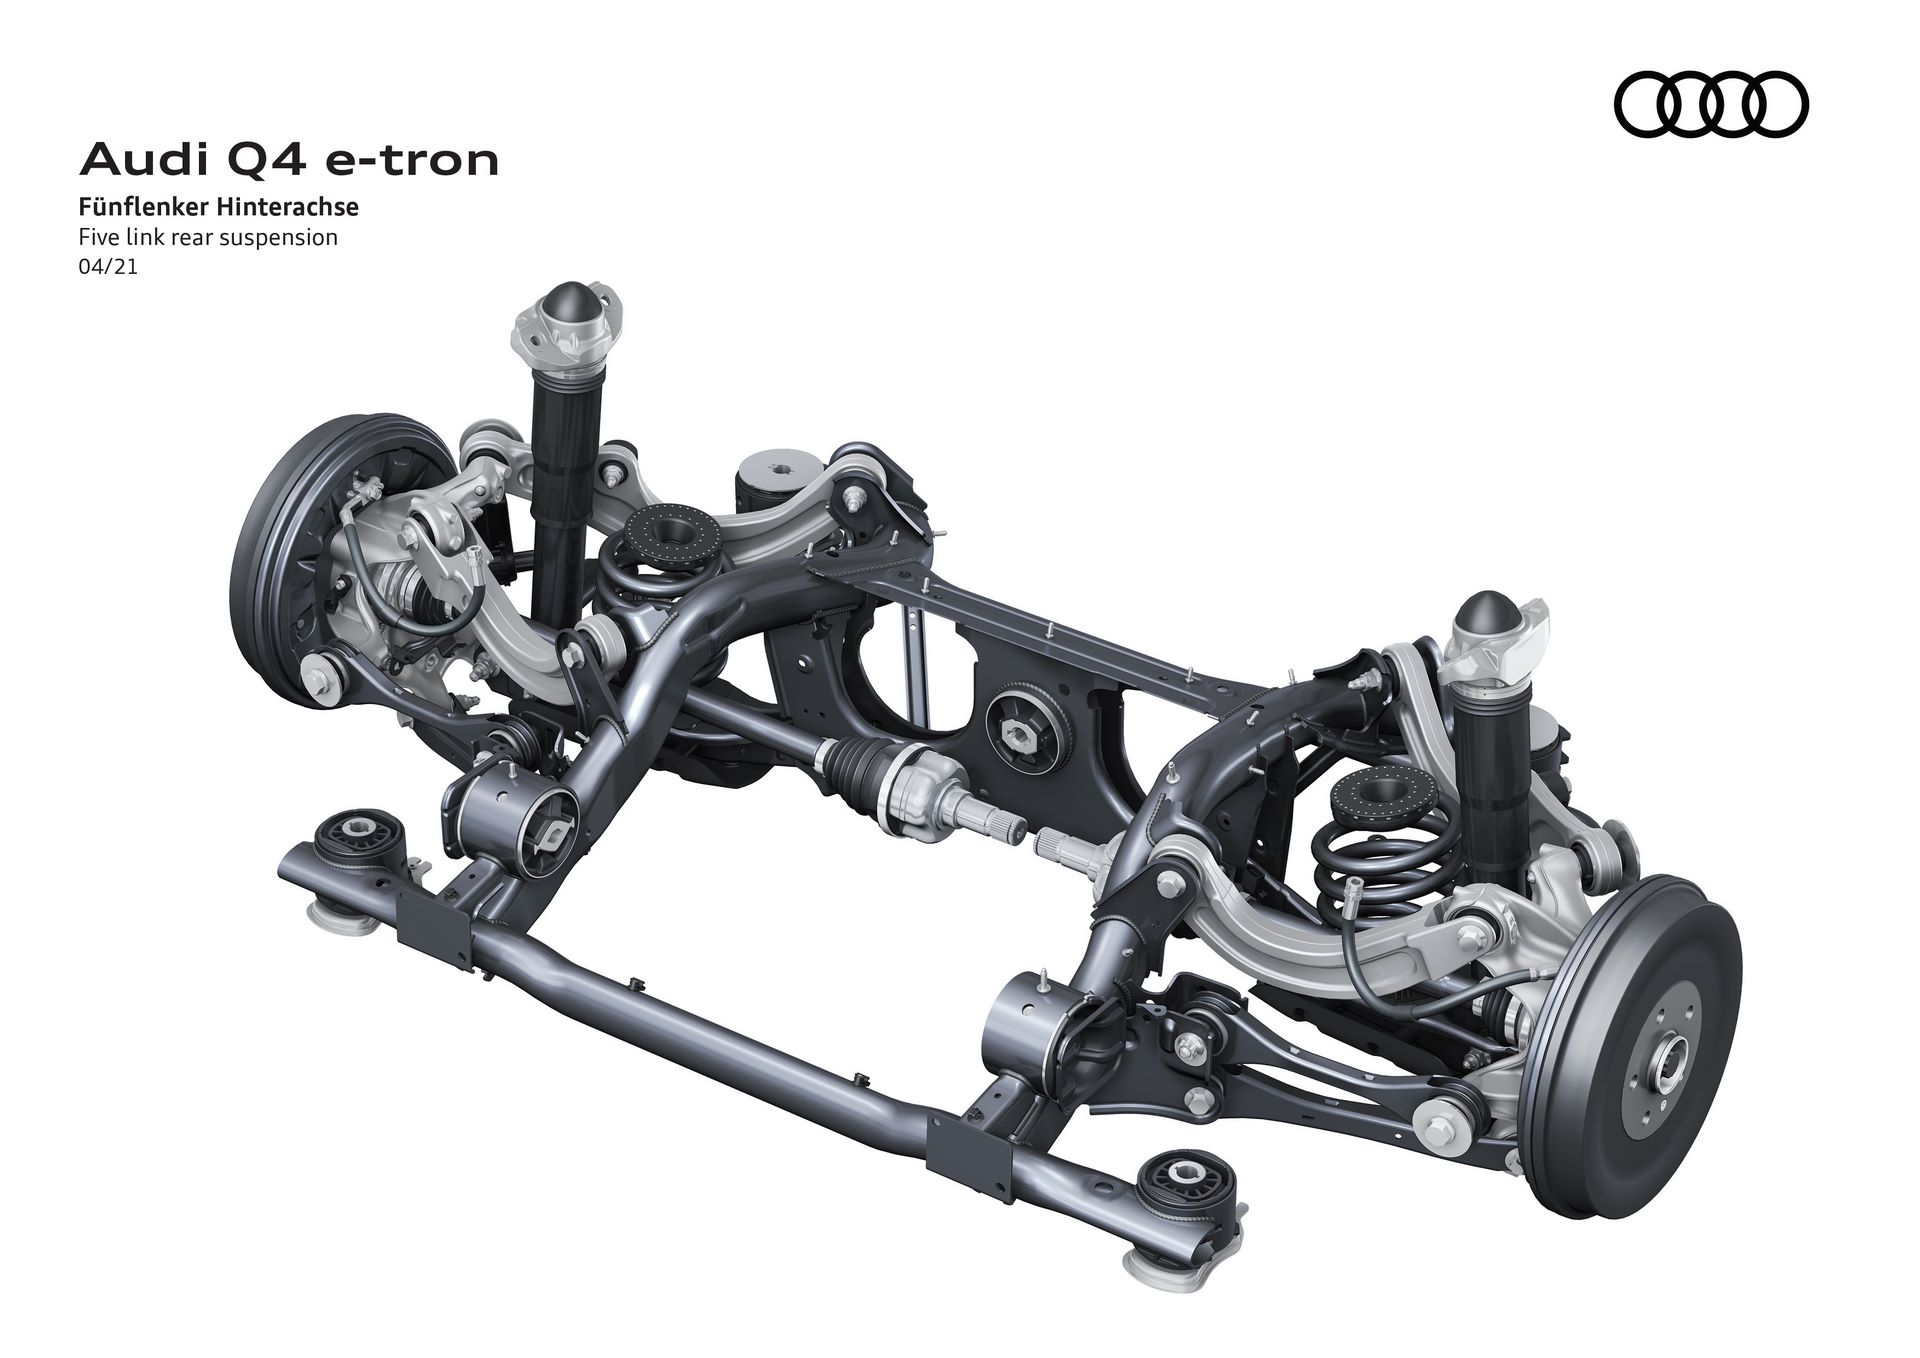 Audi-Q4-e-tron-and-Q4-e-tron-Sportback-113